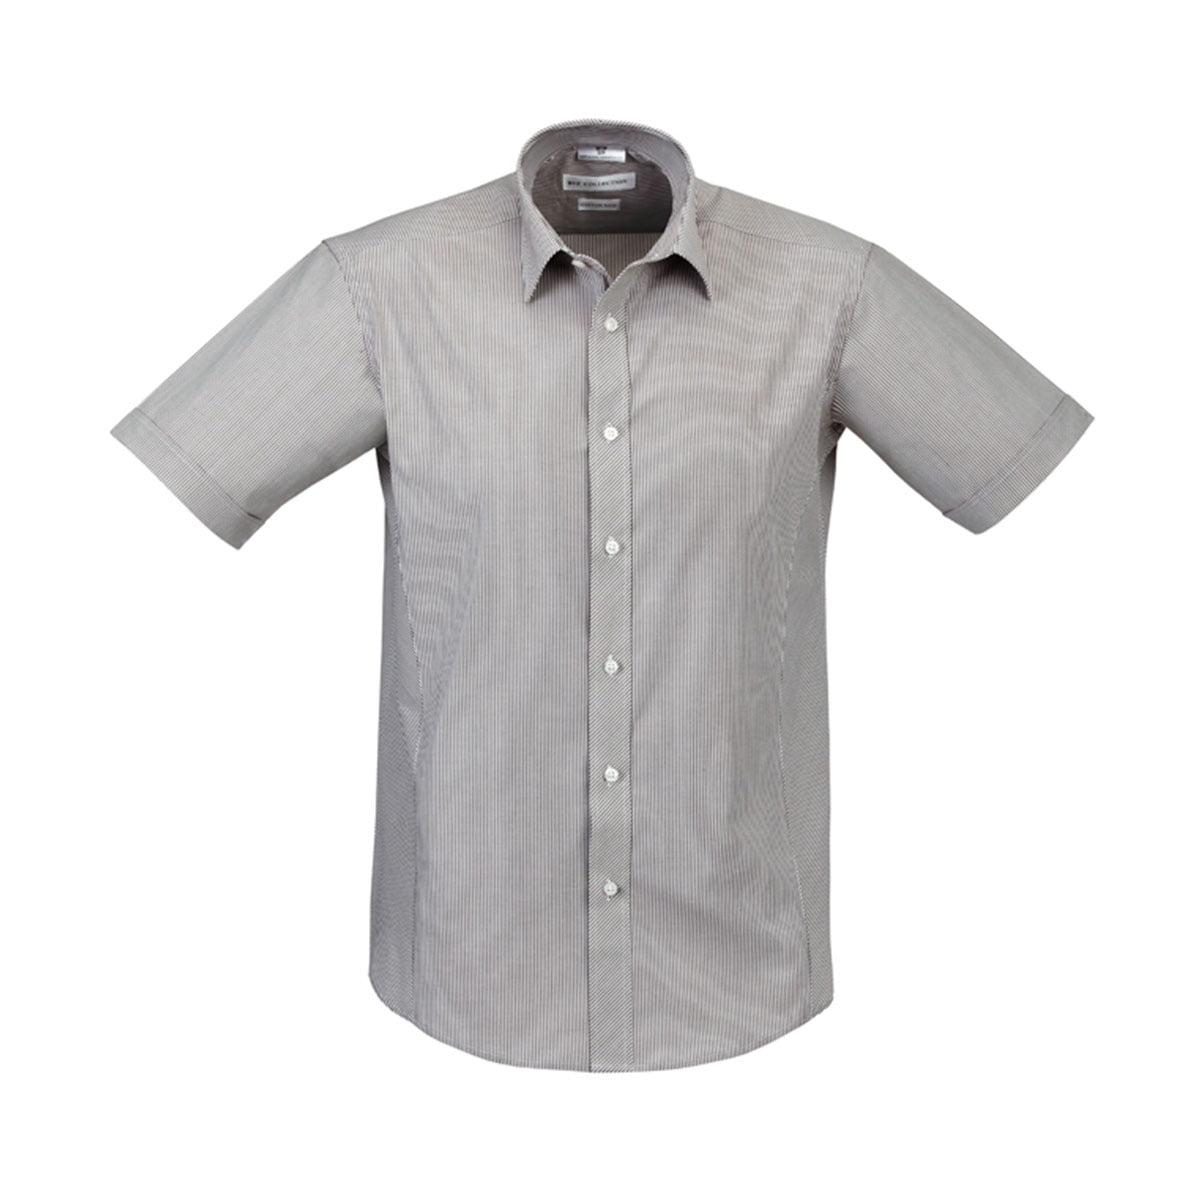 Mens Berlin Short Sleeve Shirt-Graphite Stripe